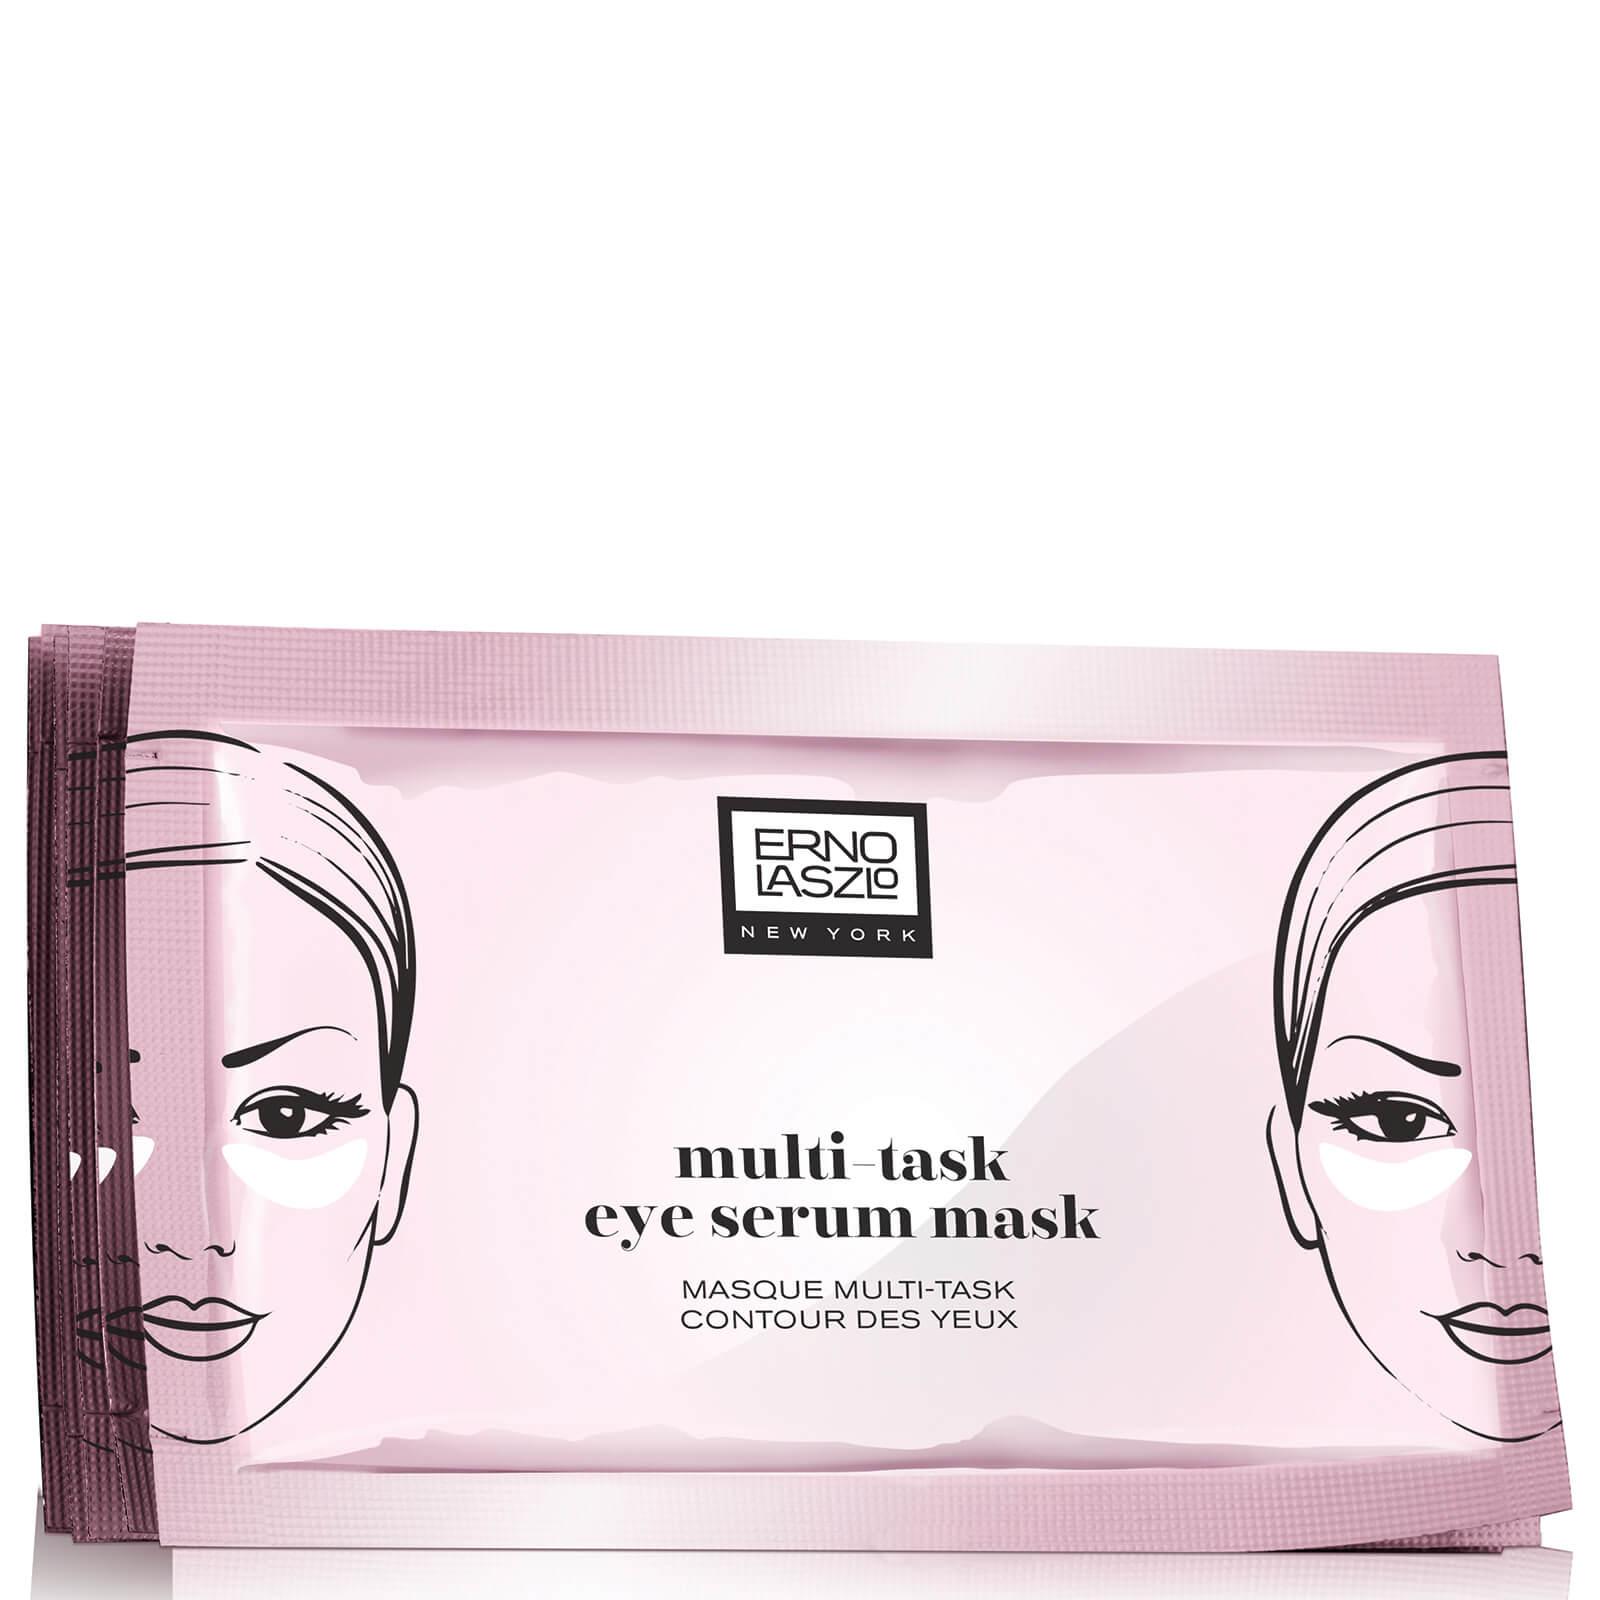 Erno Laszlo Multi-Task Eye Serum Mask